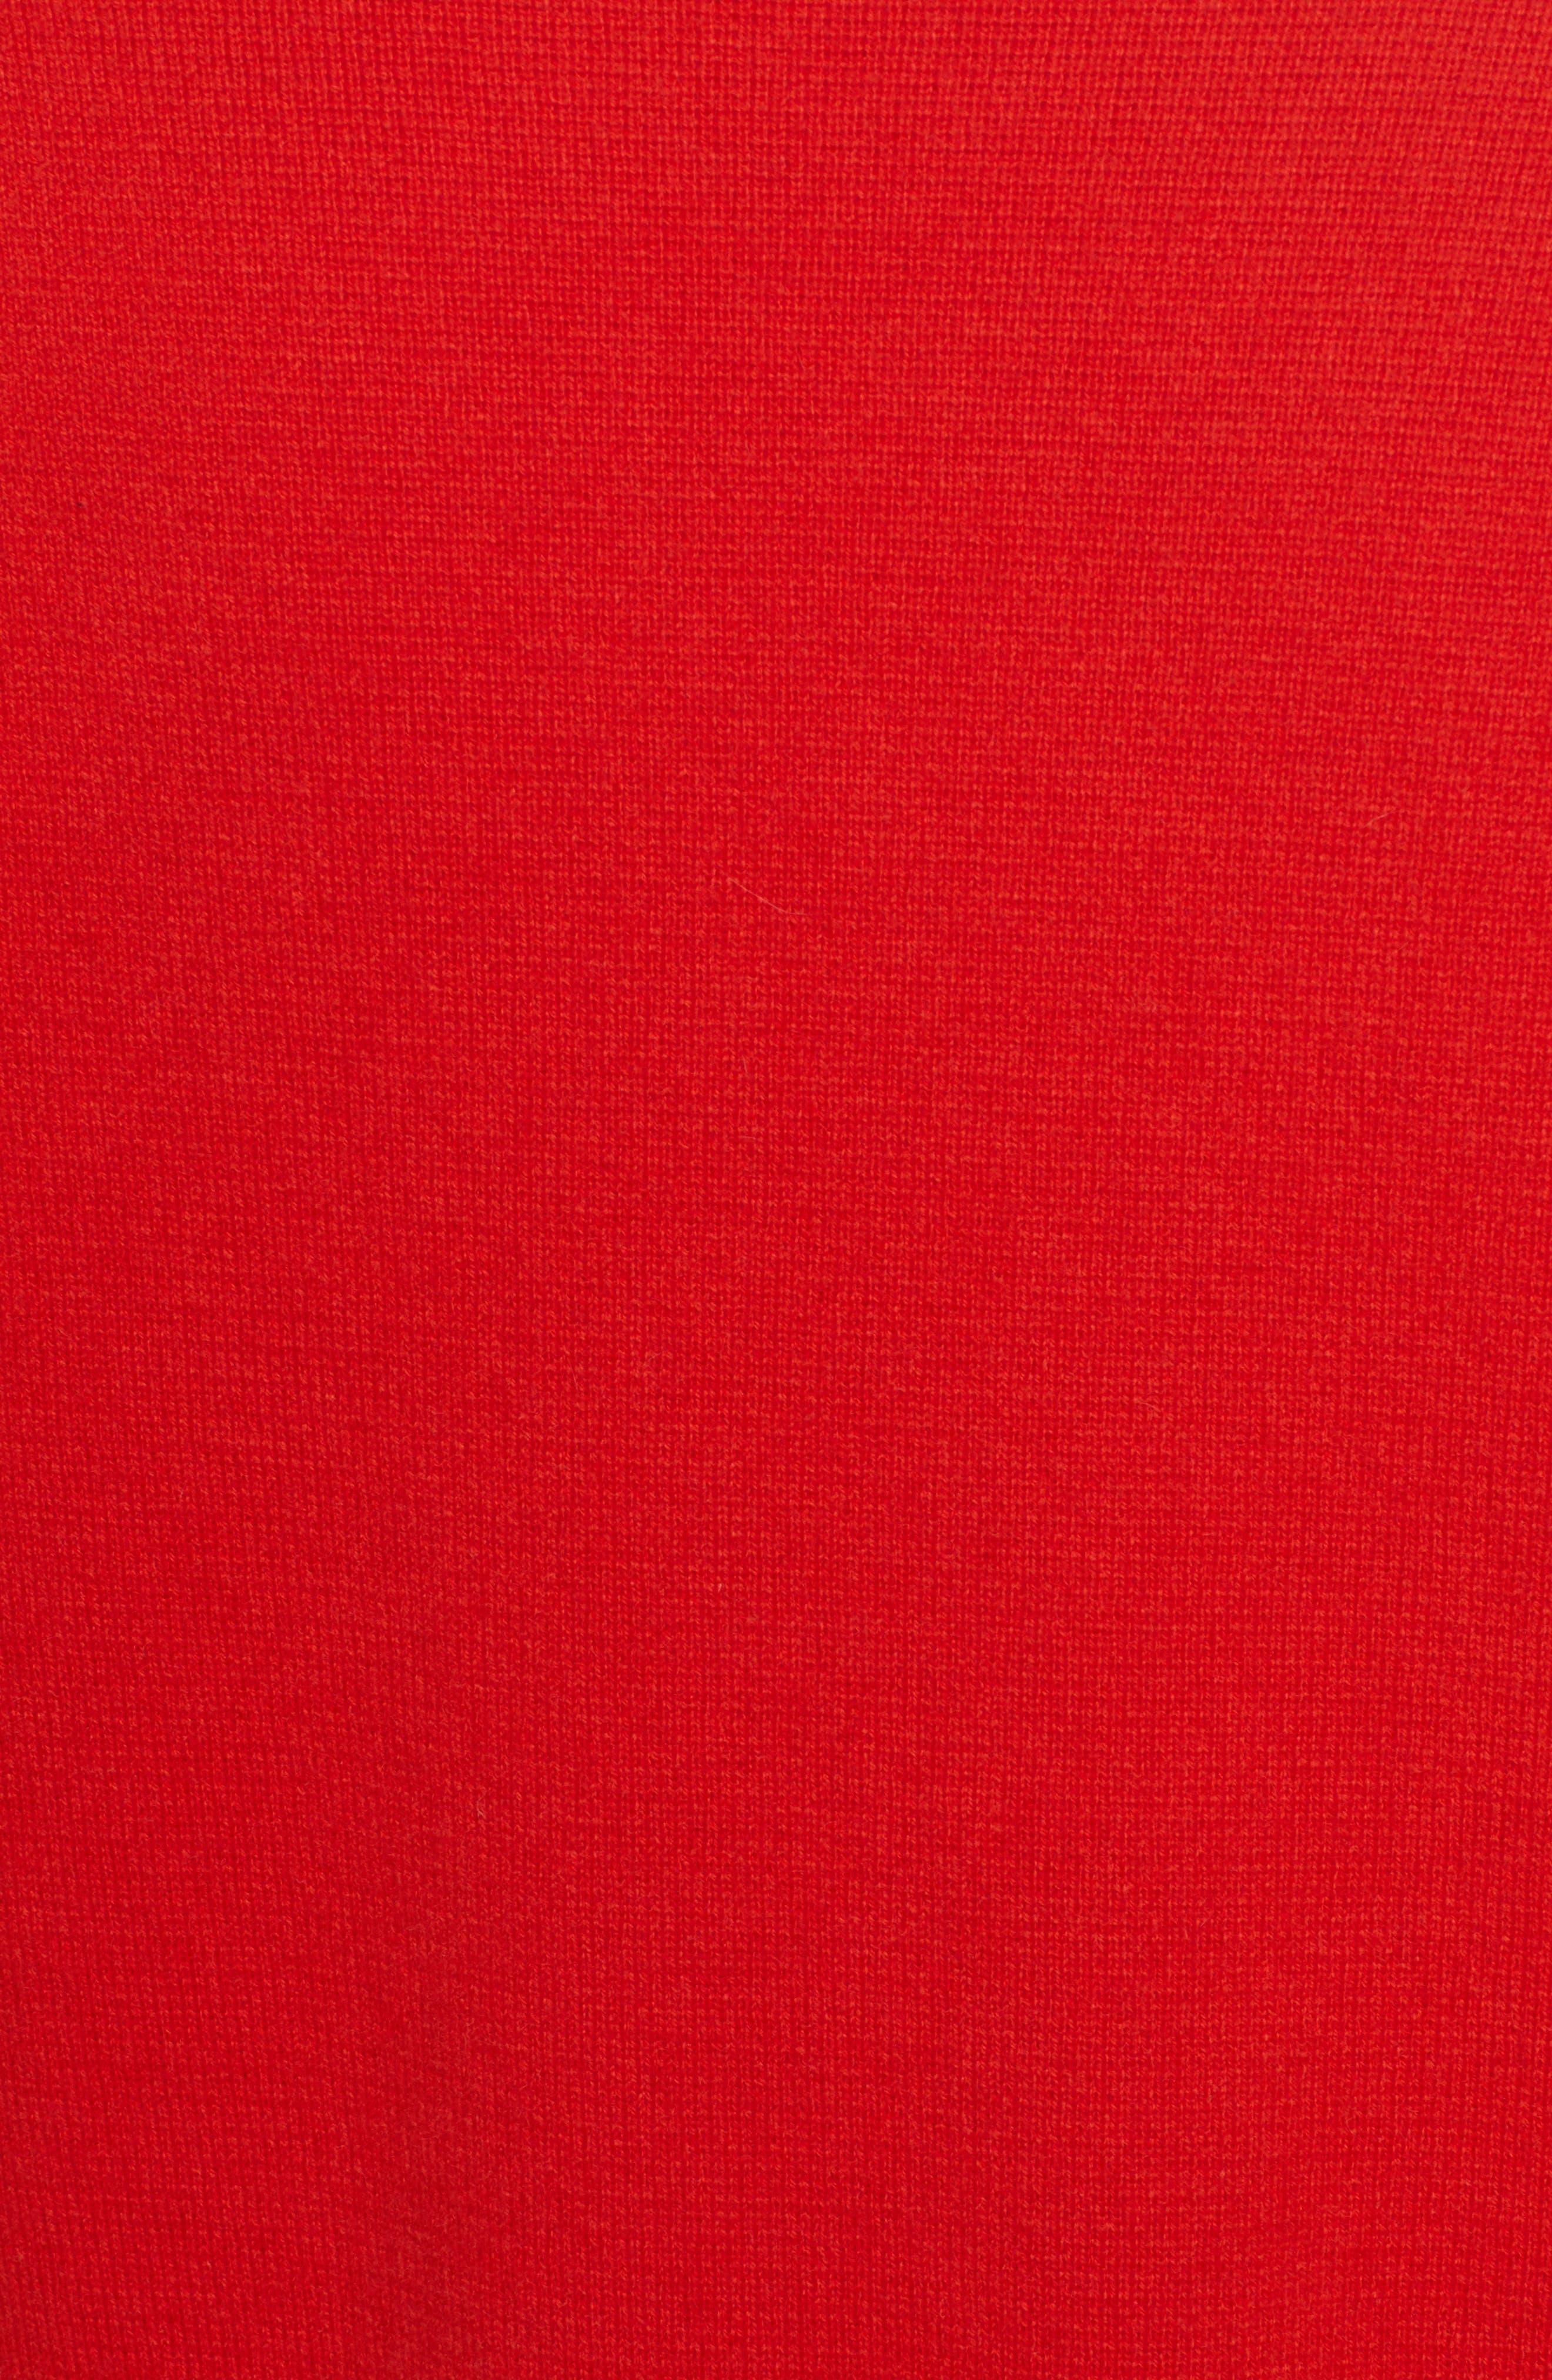 PSWL Stripe Sleeve Merino Wool & Cashmere Cardigan,                             Alternate thumbnail 5, color,                             RED COMBO